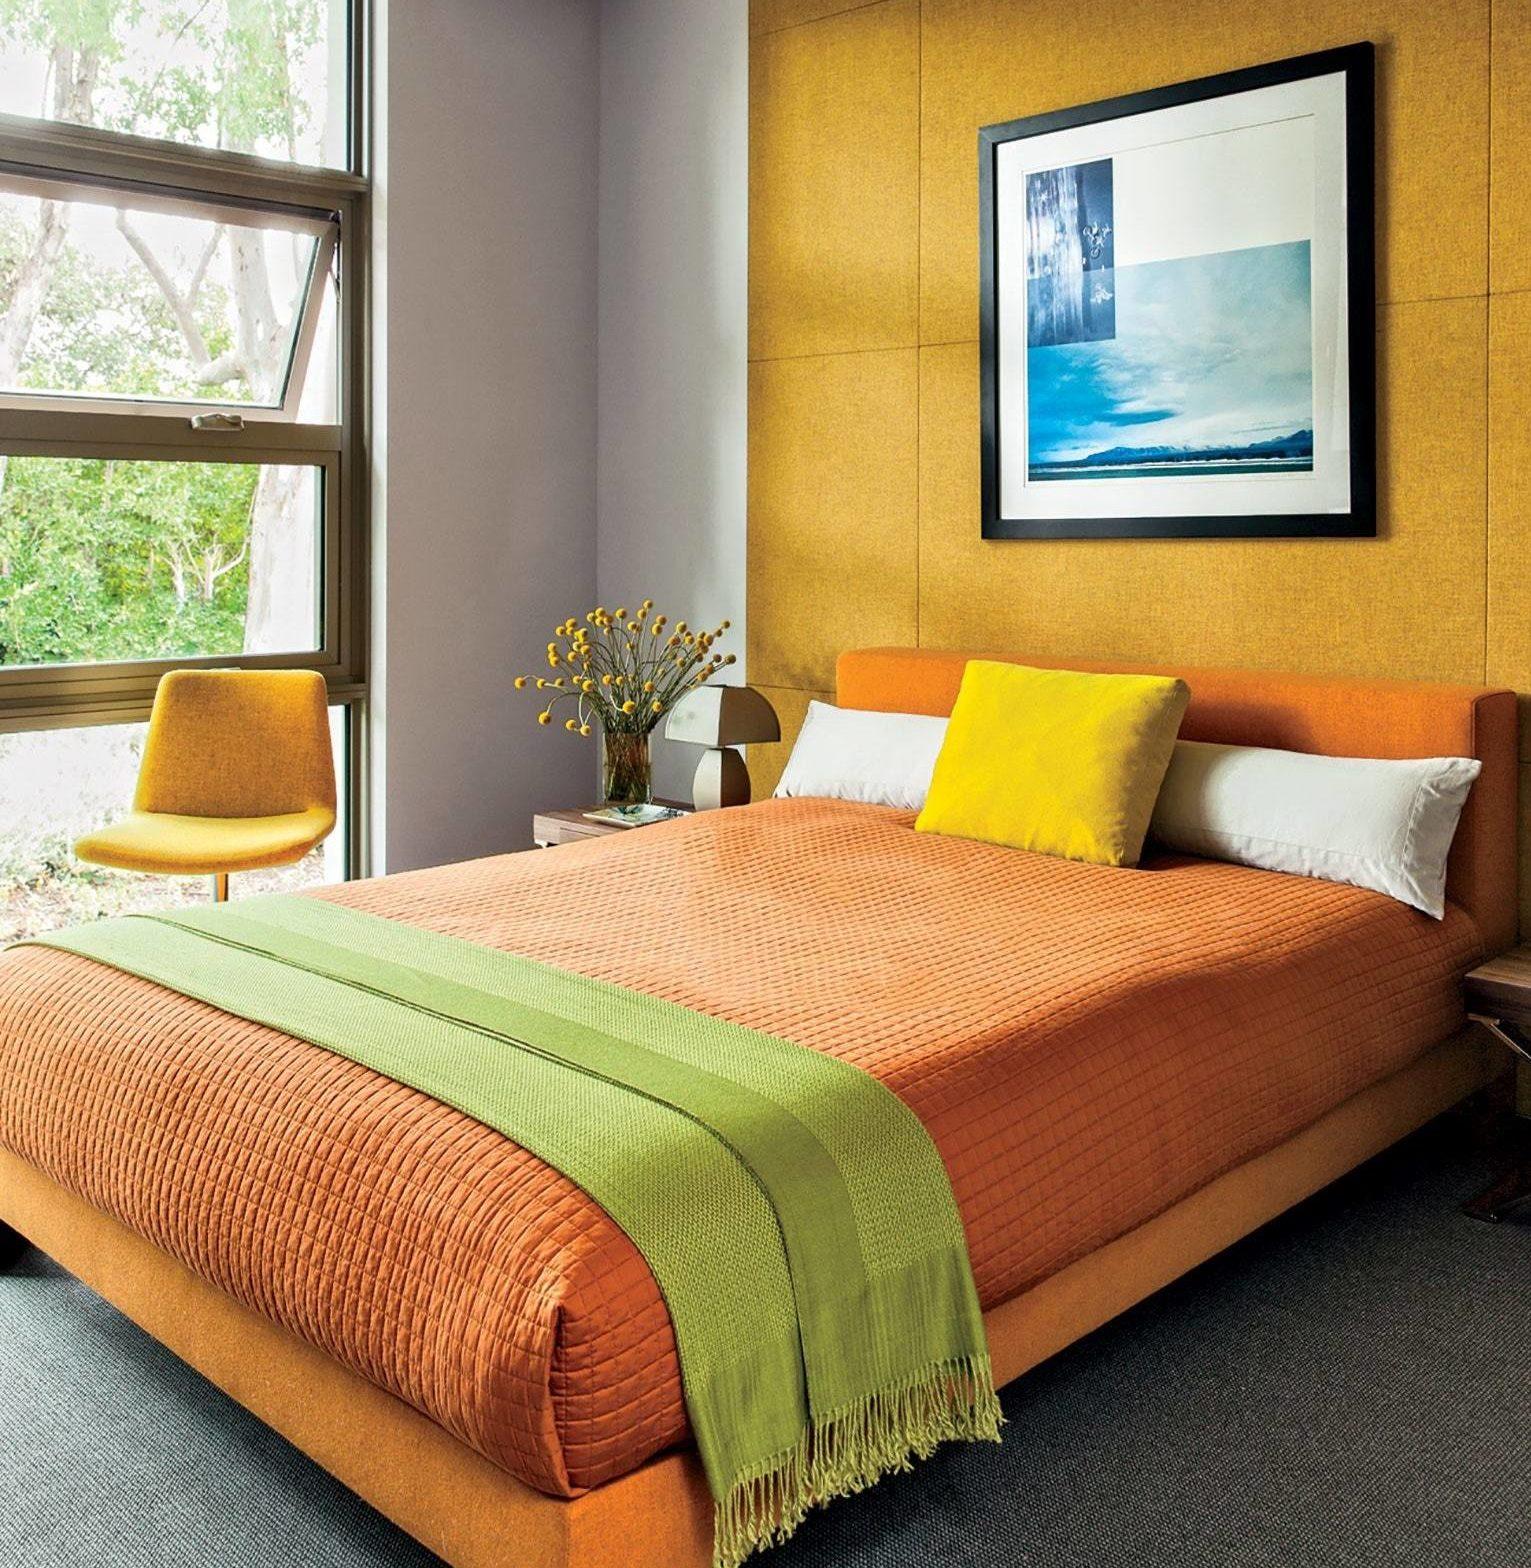 Bright Terra Cotta Colorful Bedroom Bold Yellow Orange Palette